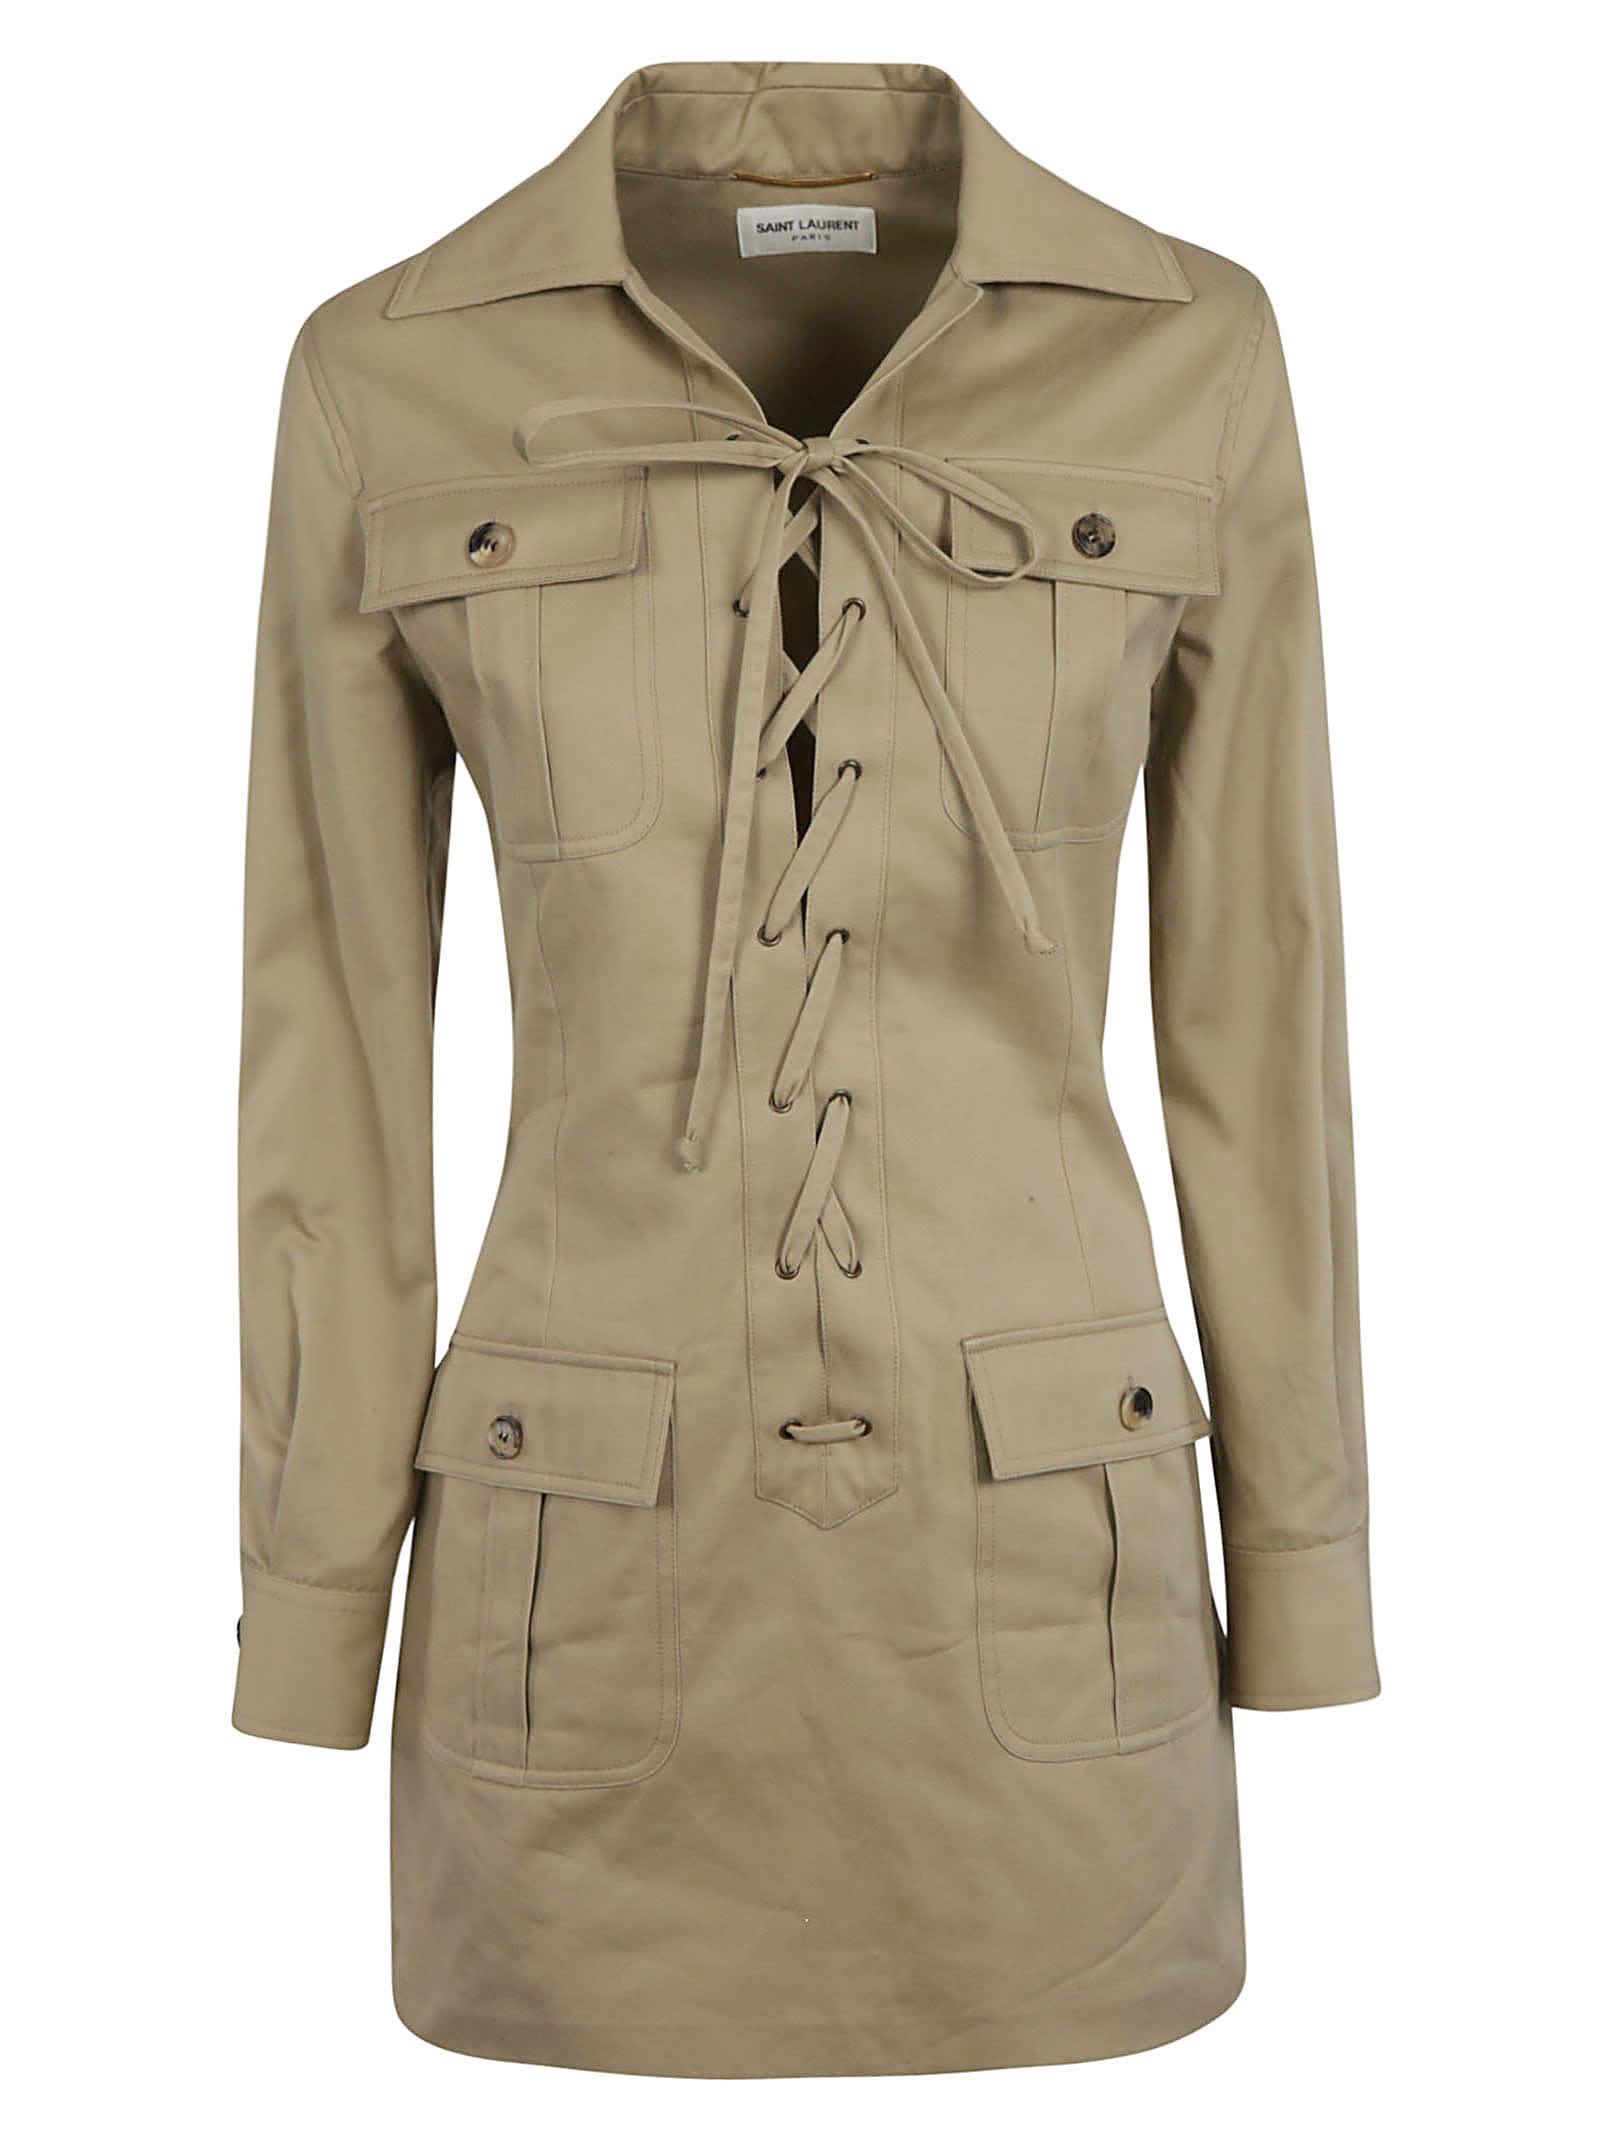 Buy Saint Laurent Tied Detail Woven Dress online, shop Saint Laurent with free shipping